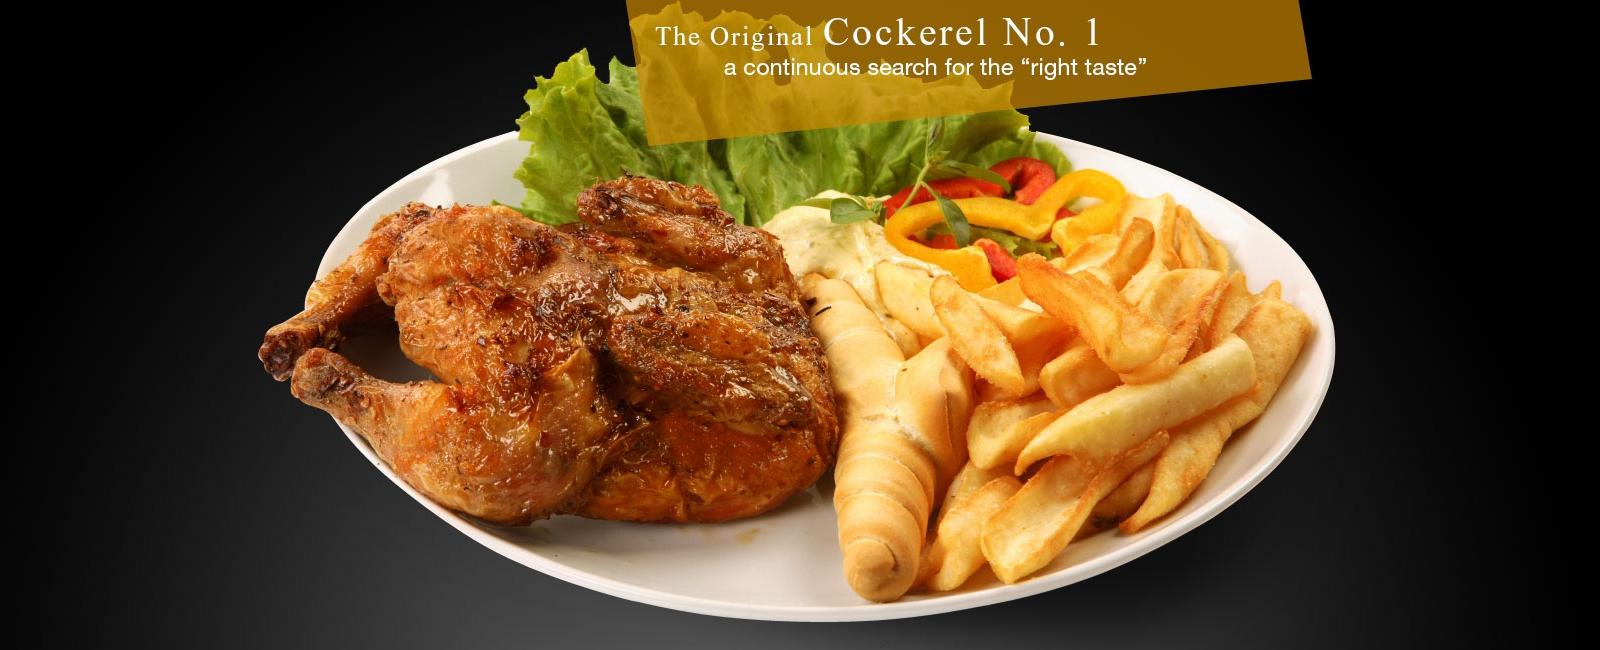 <div>The original Cockerel No. 1<br />a continuous search for the 'right taste'.</div>